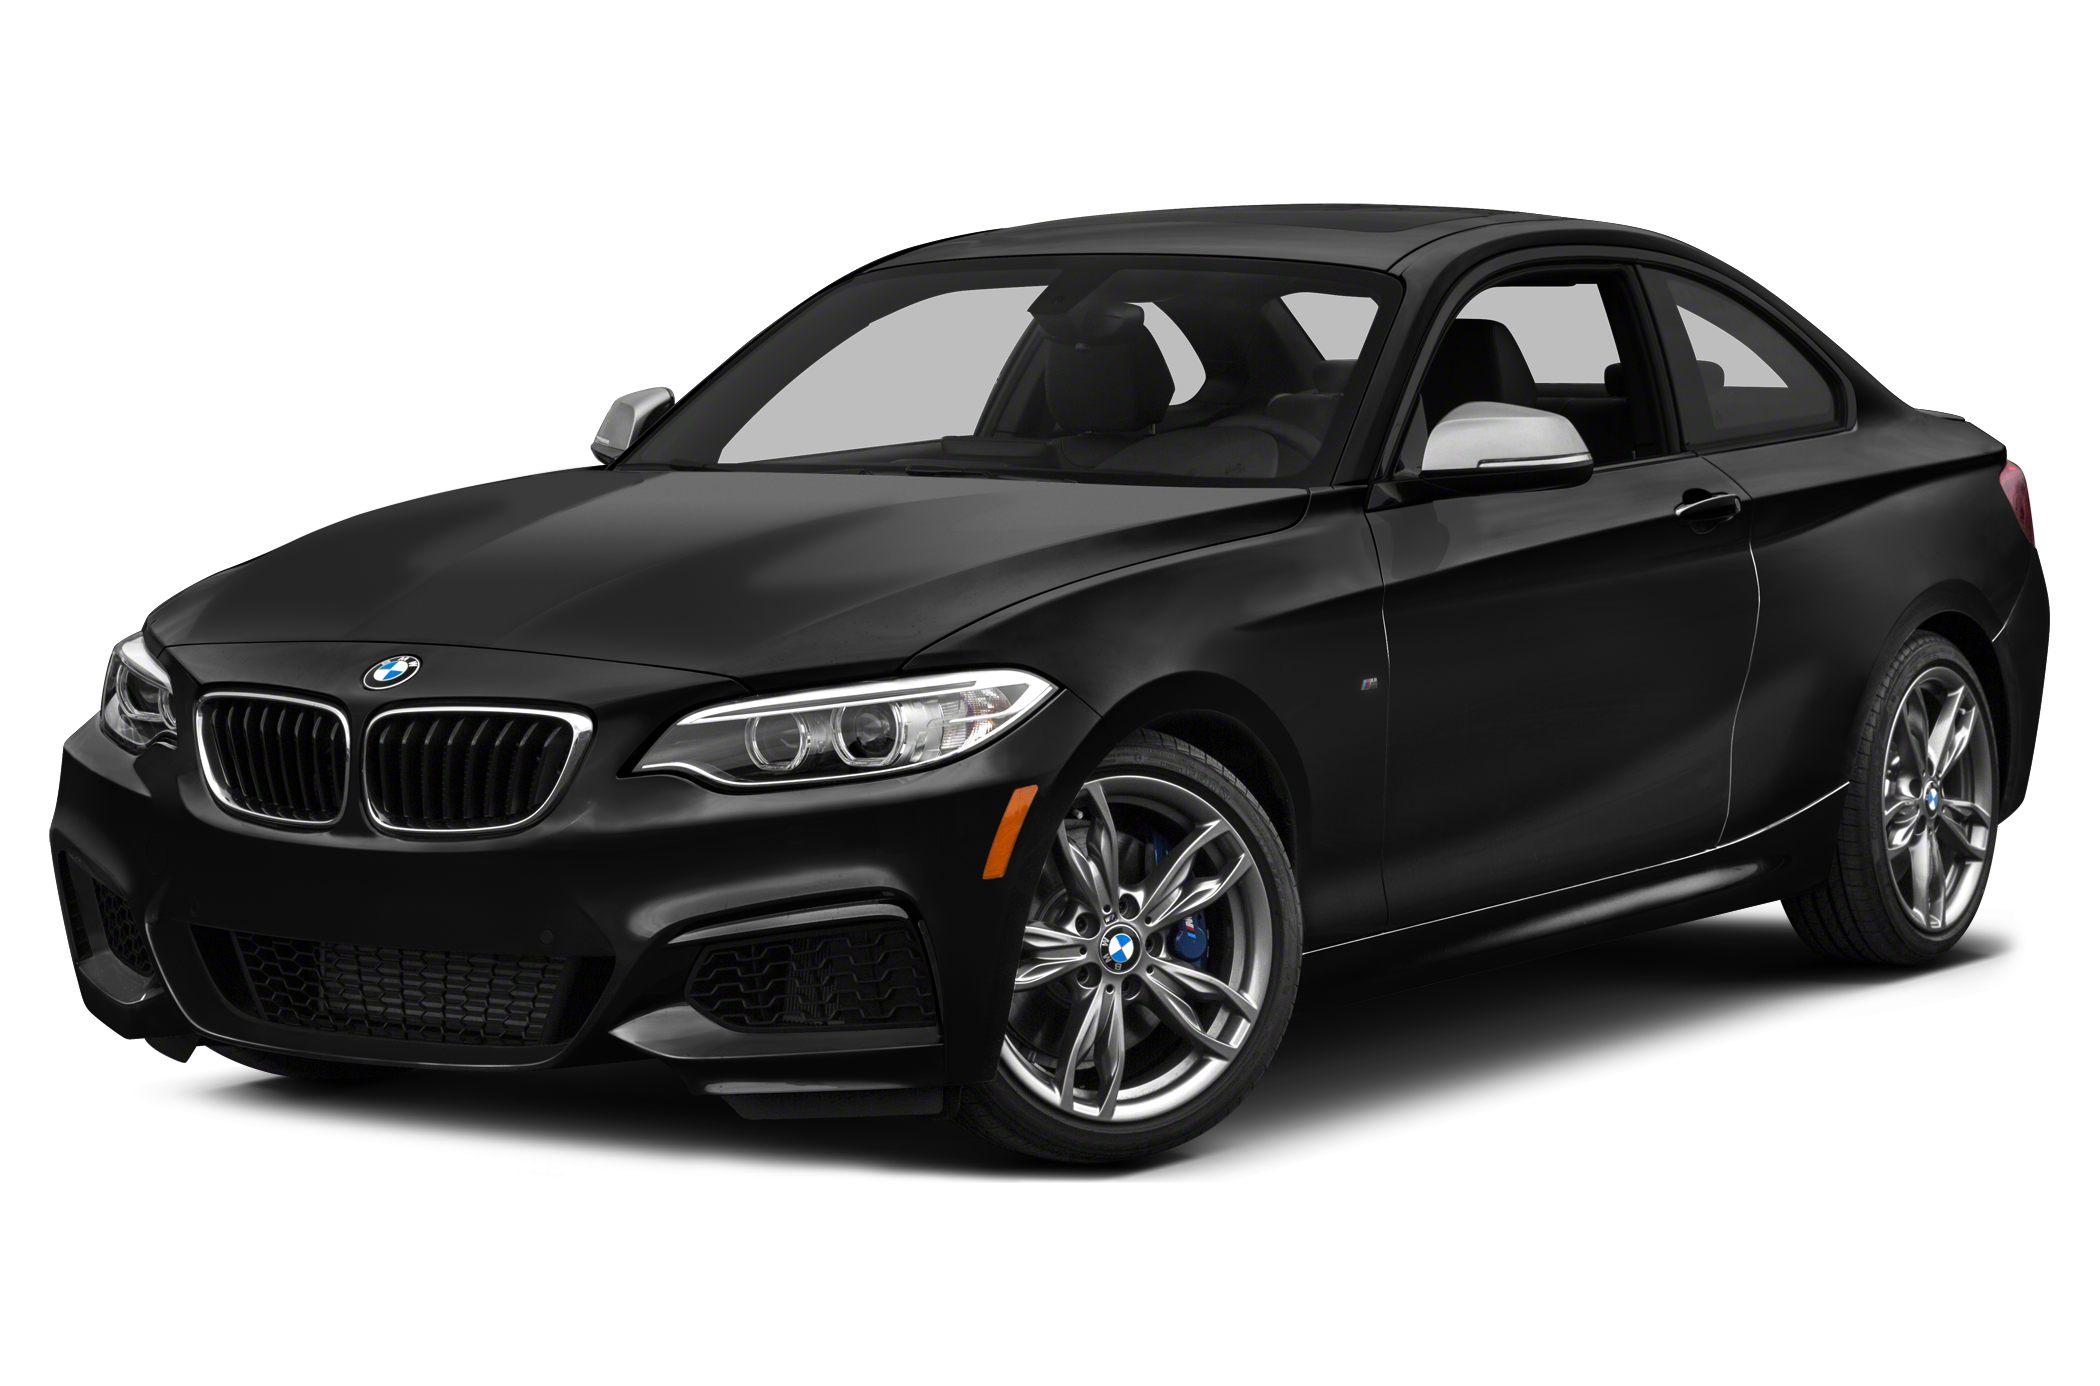 2015 BMW M235 i 2dr Rear wheel Drive Coupe Review Autoblog